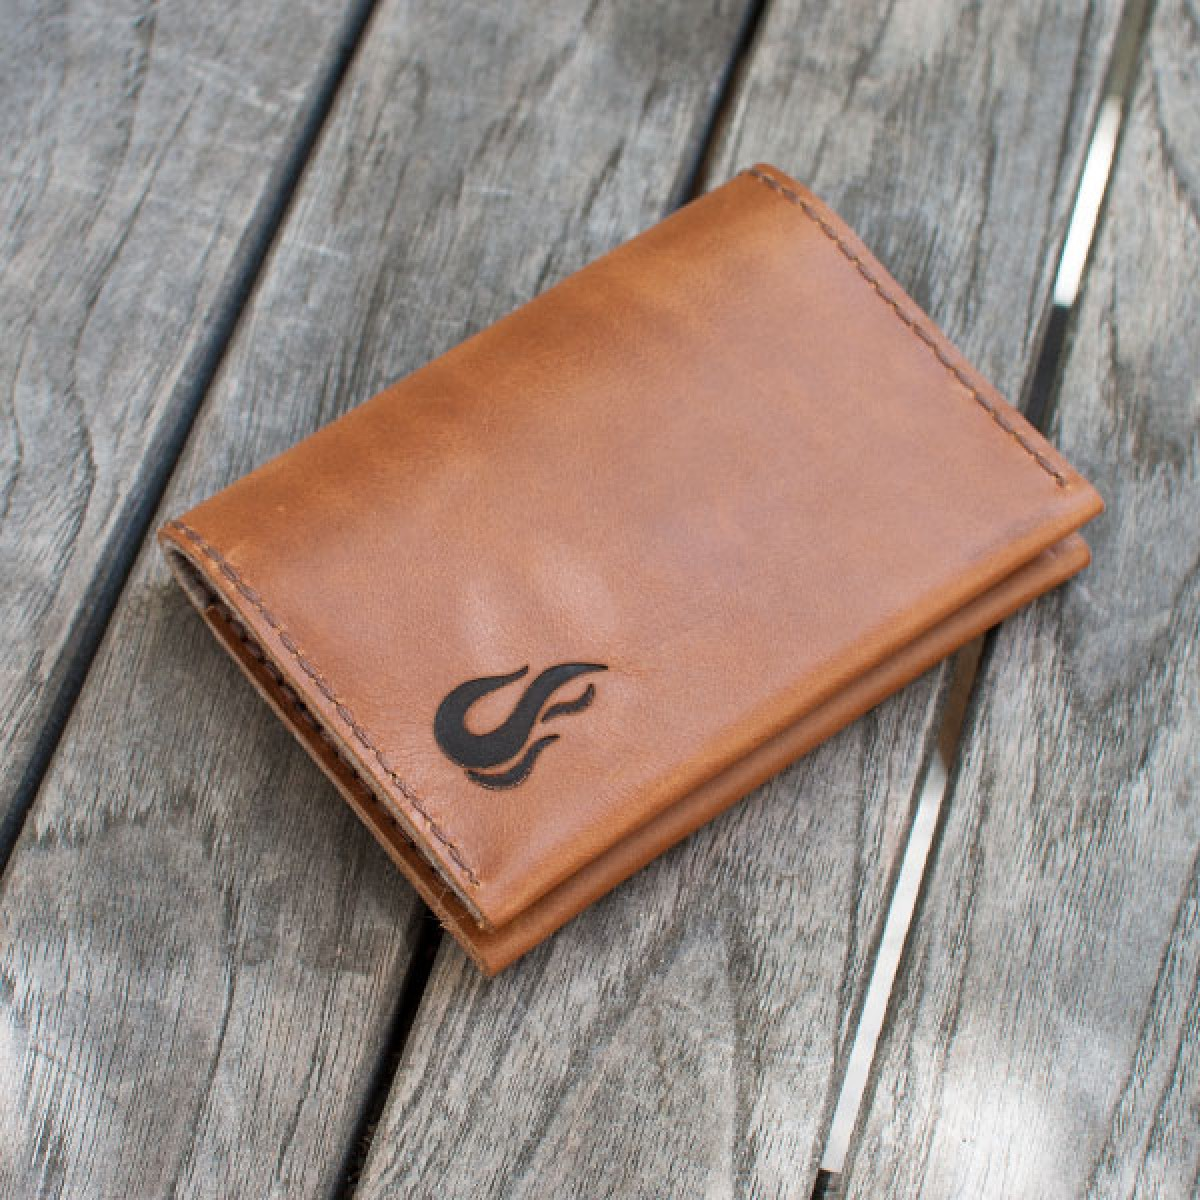 Leather Wallet - Geldbörse aus cognacfarbenem Leder - Portemonnaie - Burning Love